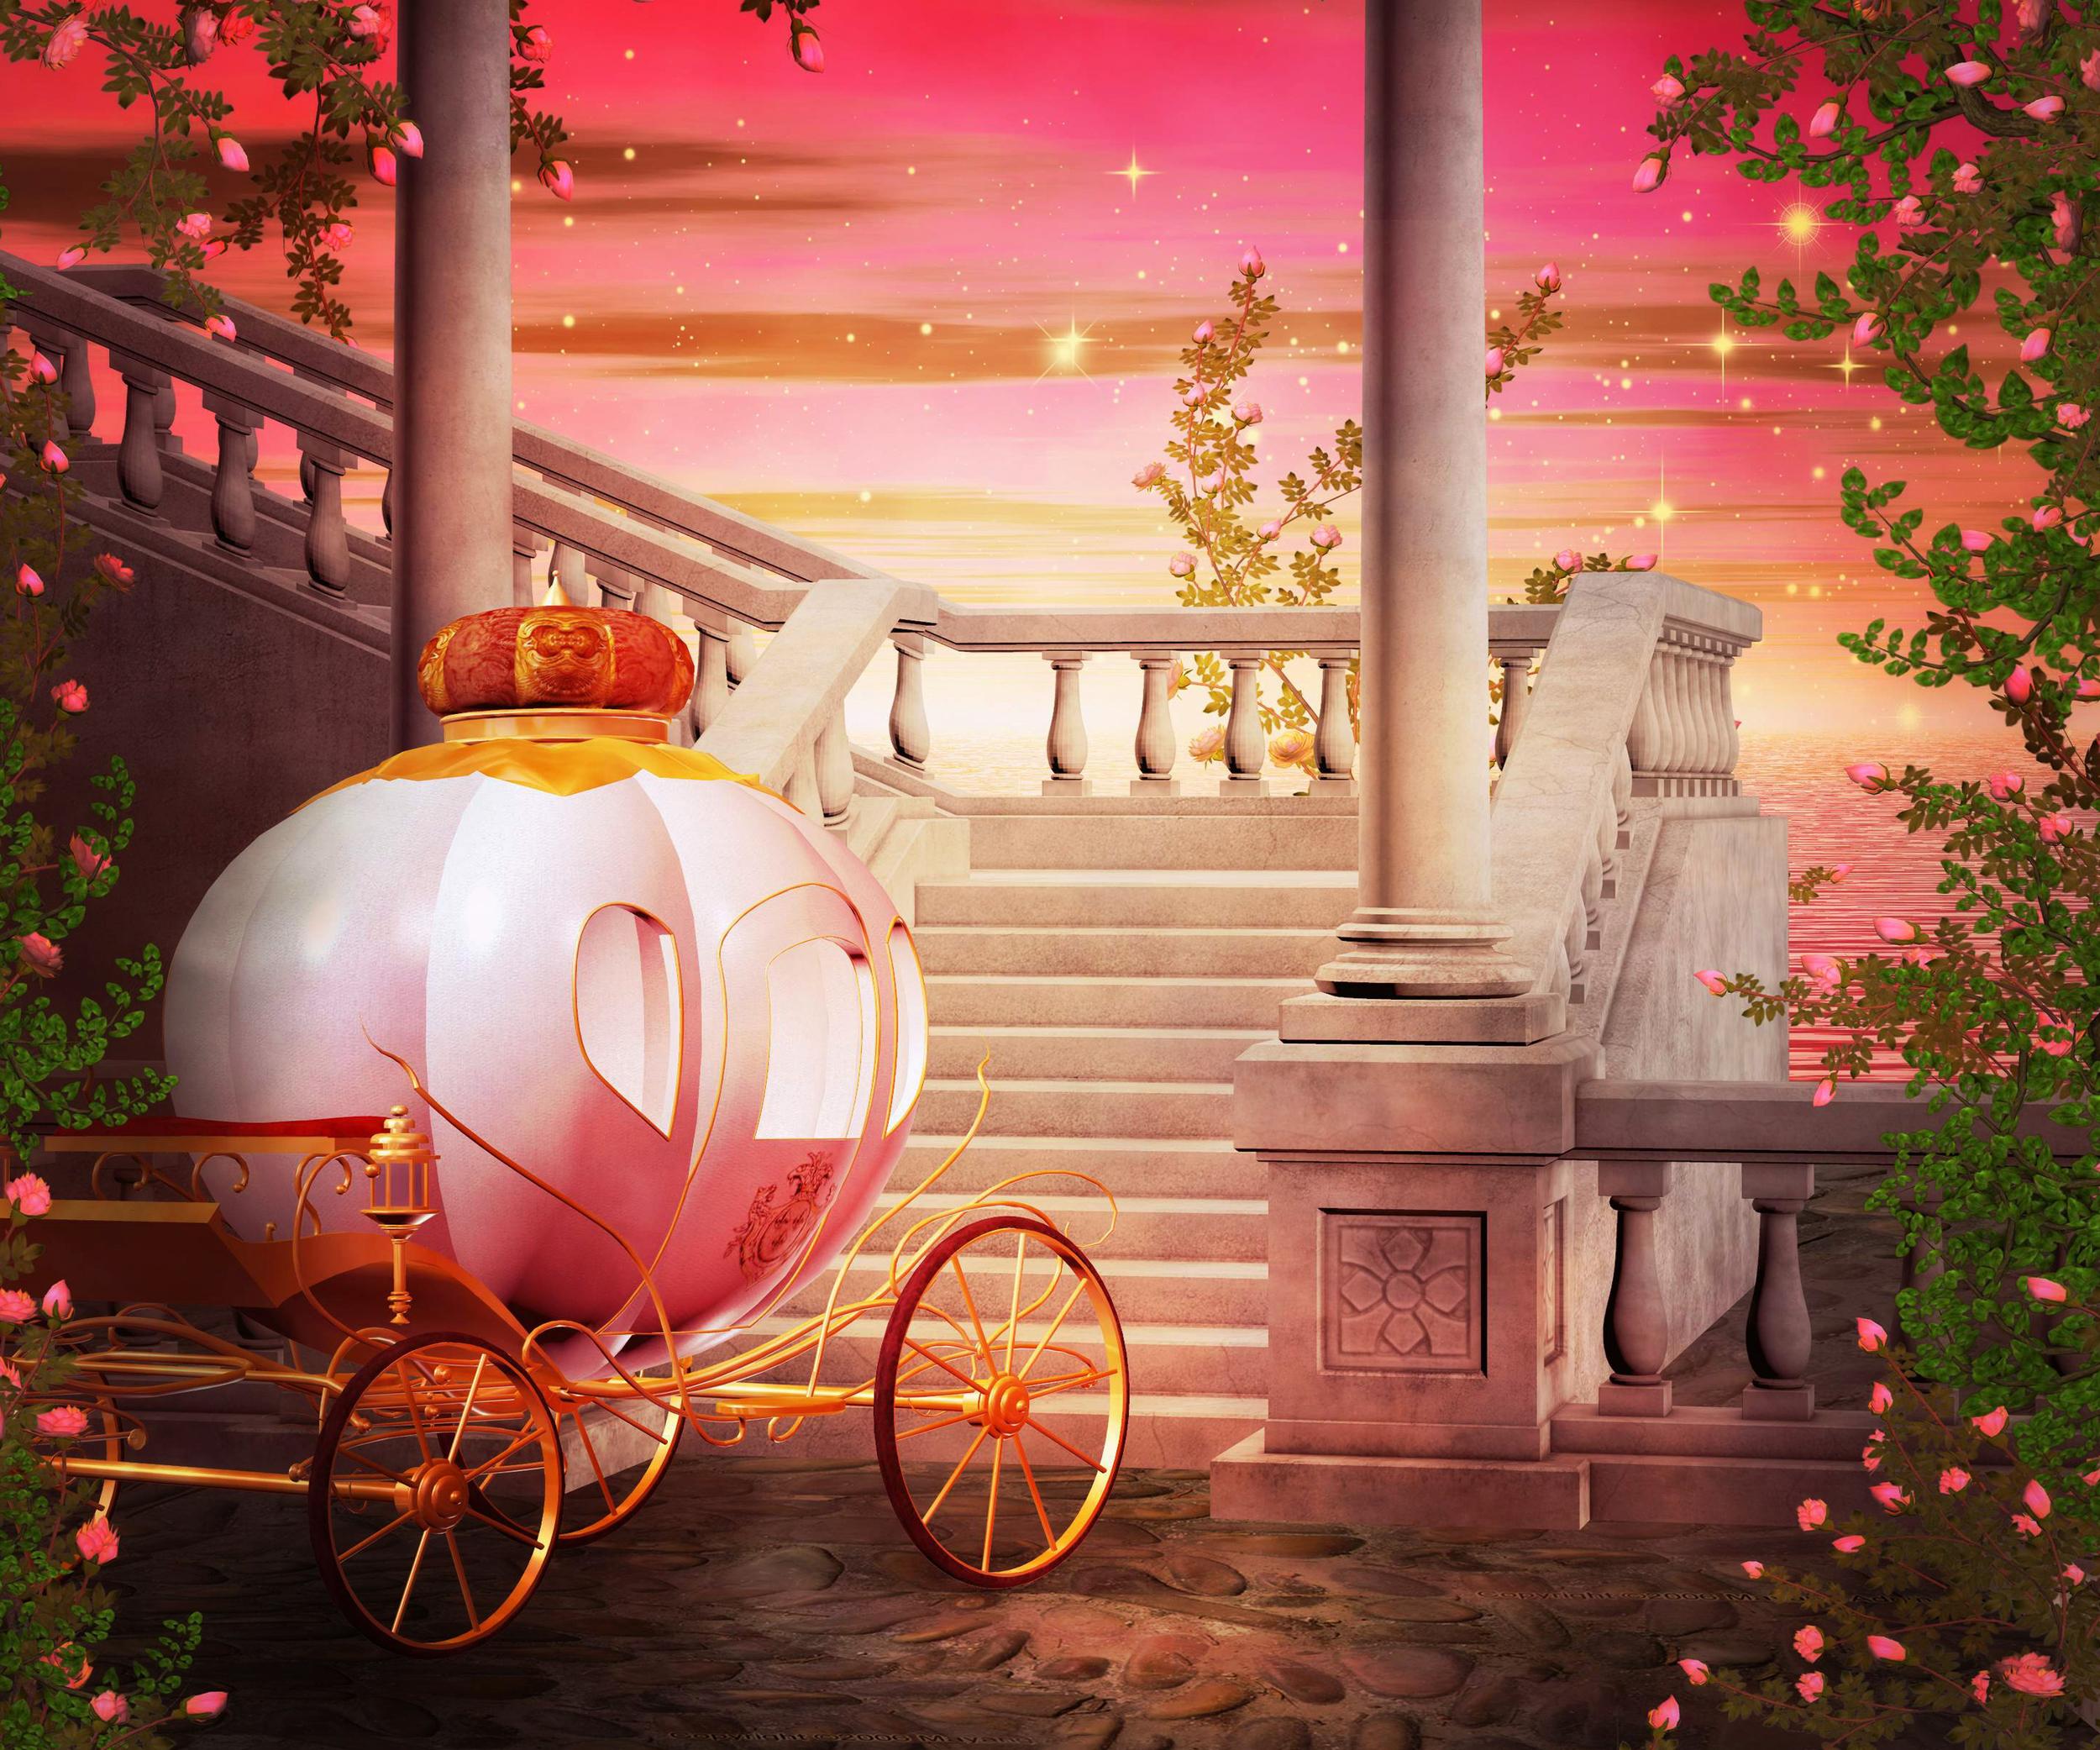 carriage-castle-fantasy-backdrop_z12HVD5_.jpg